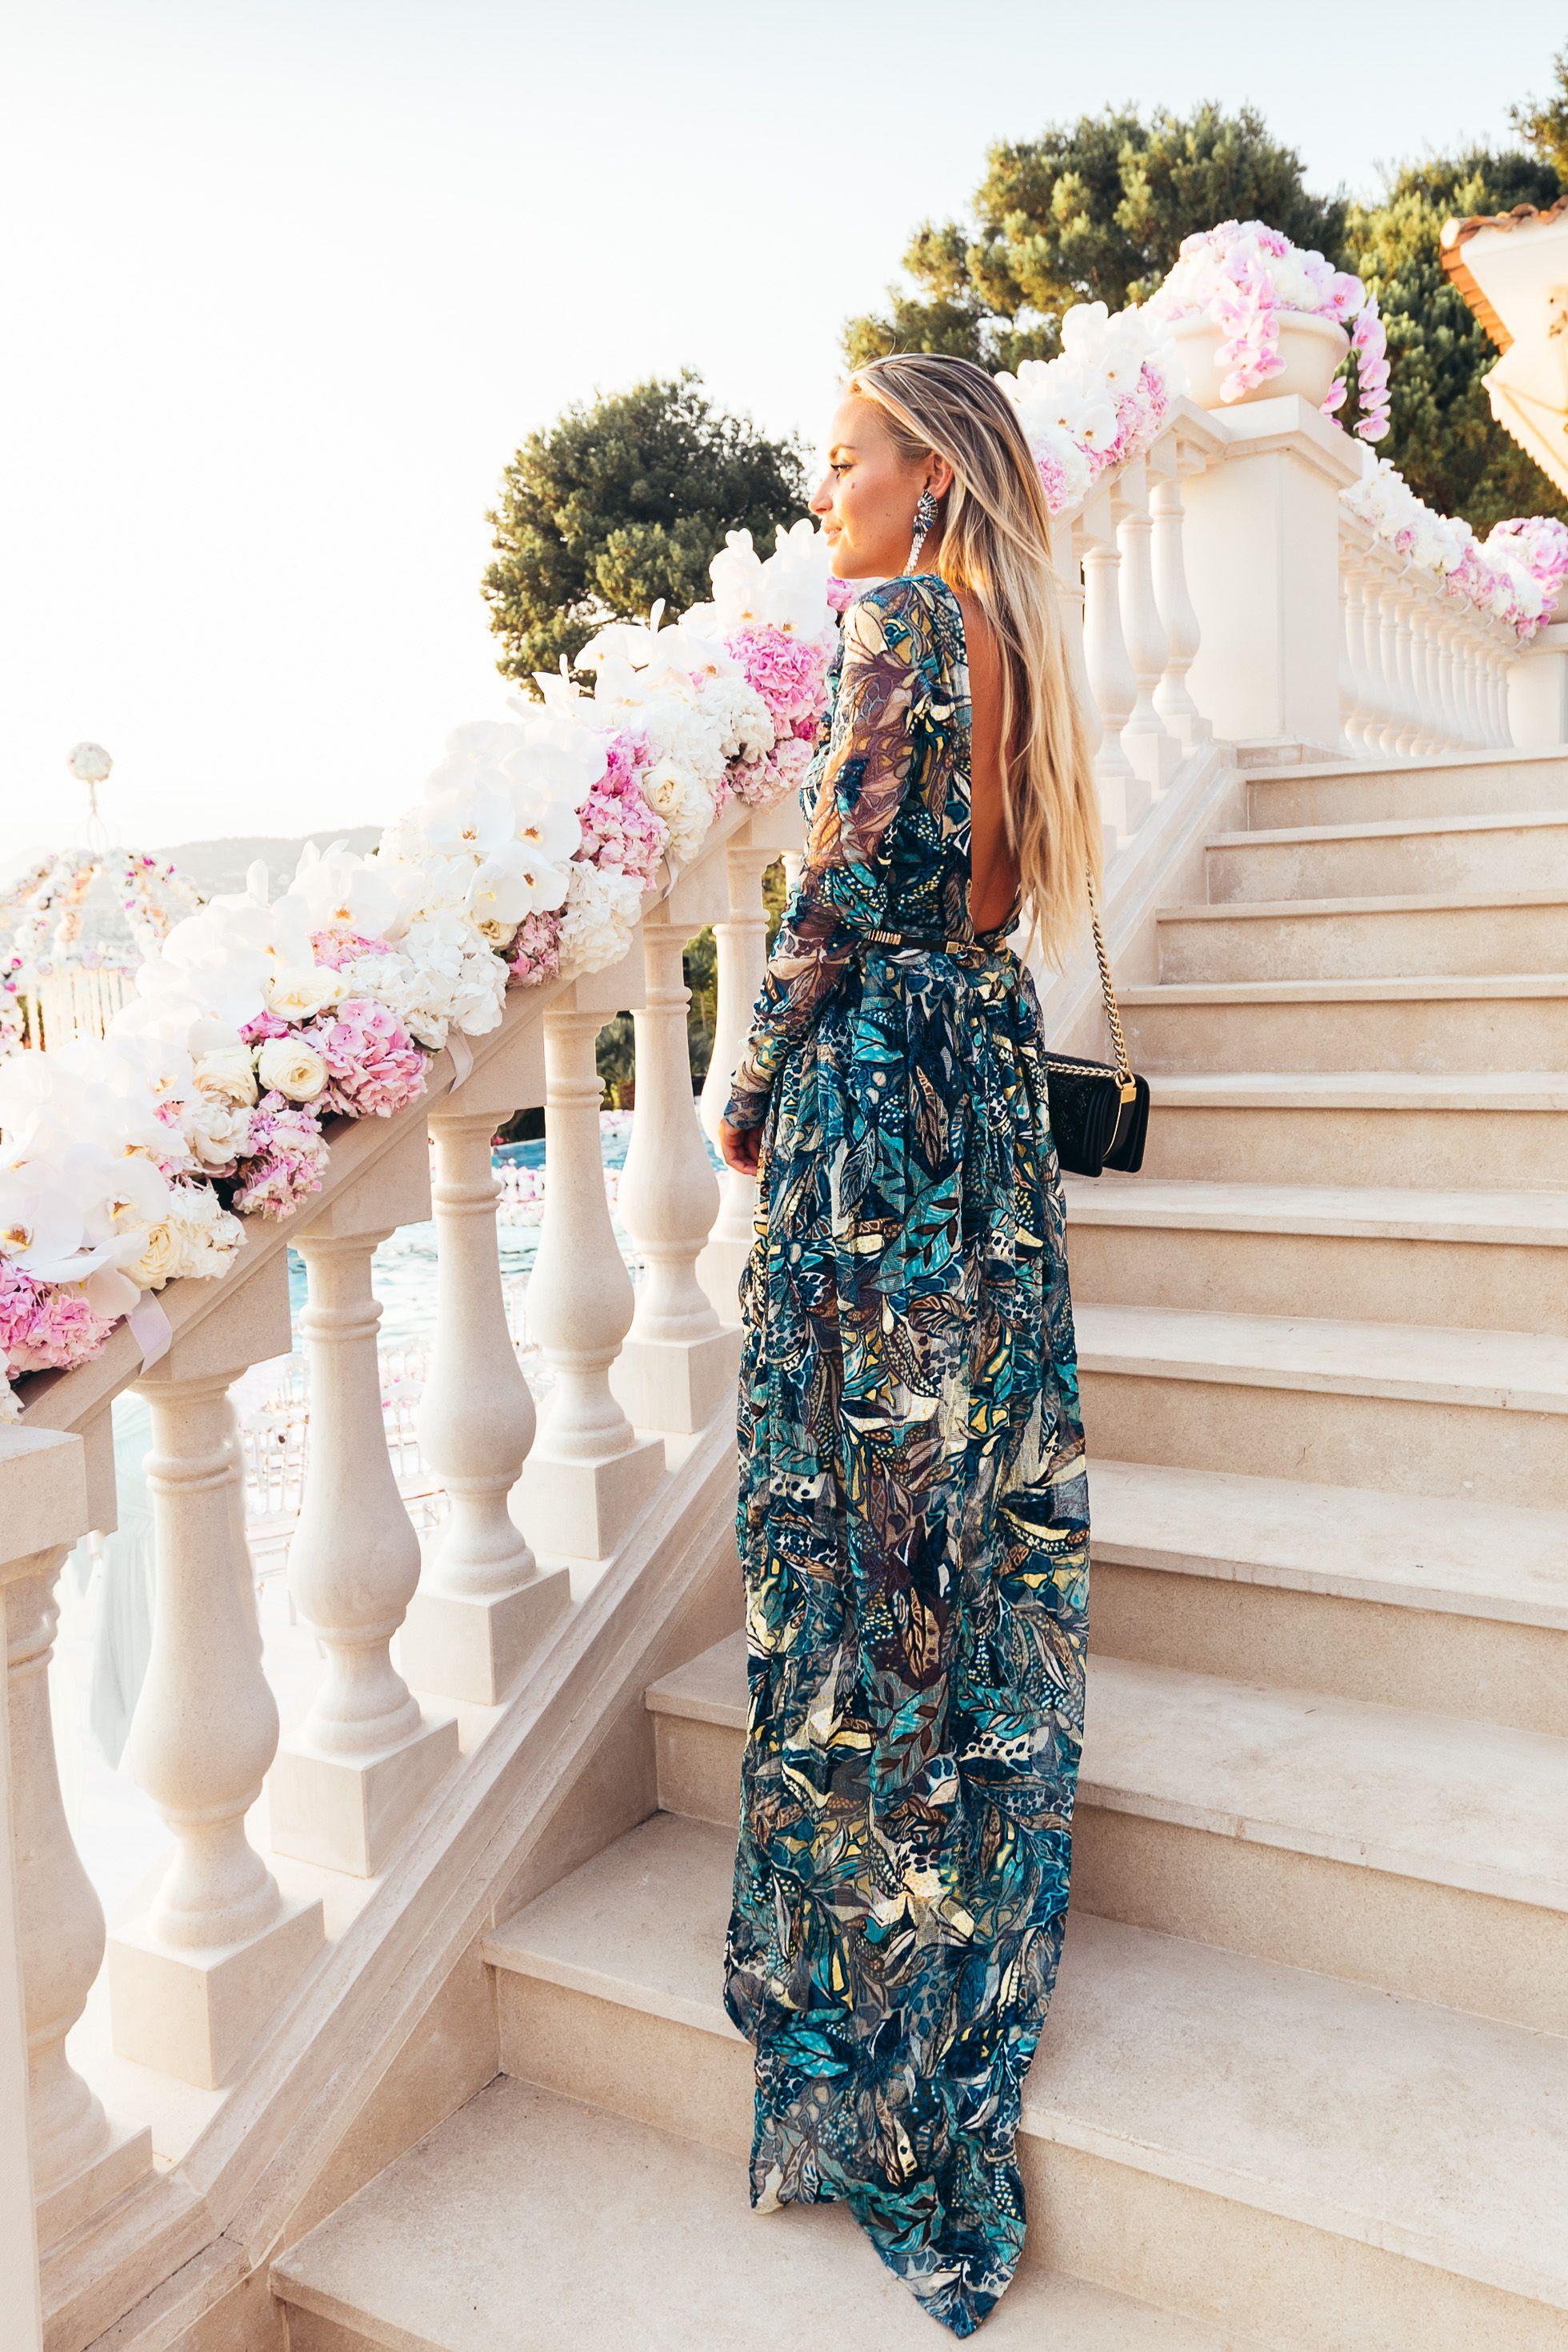 Pin by ashley brennan on stylelust pinterest wedding clothes